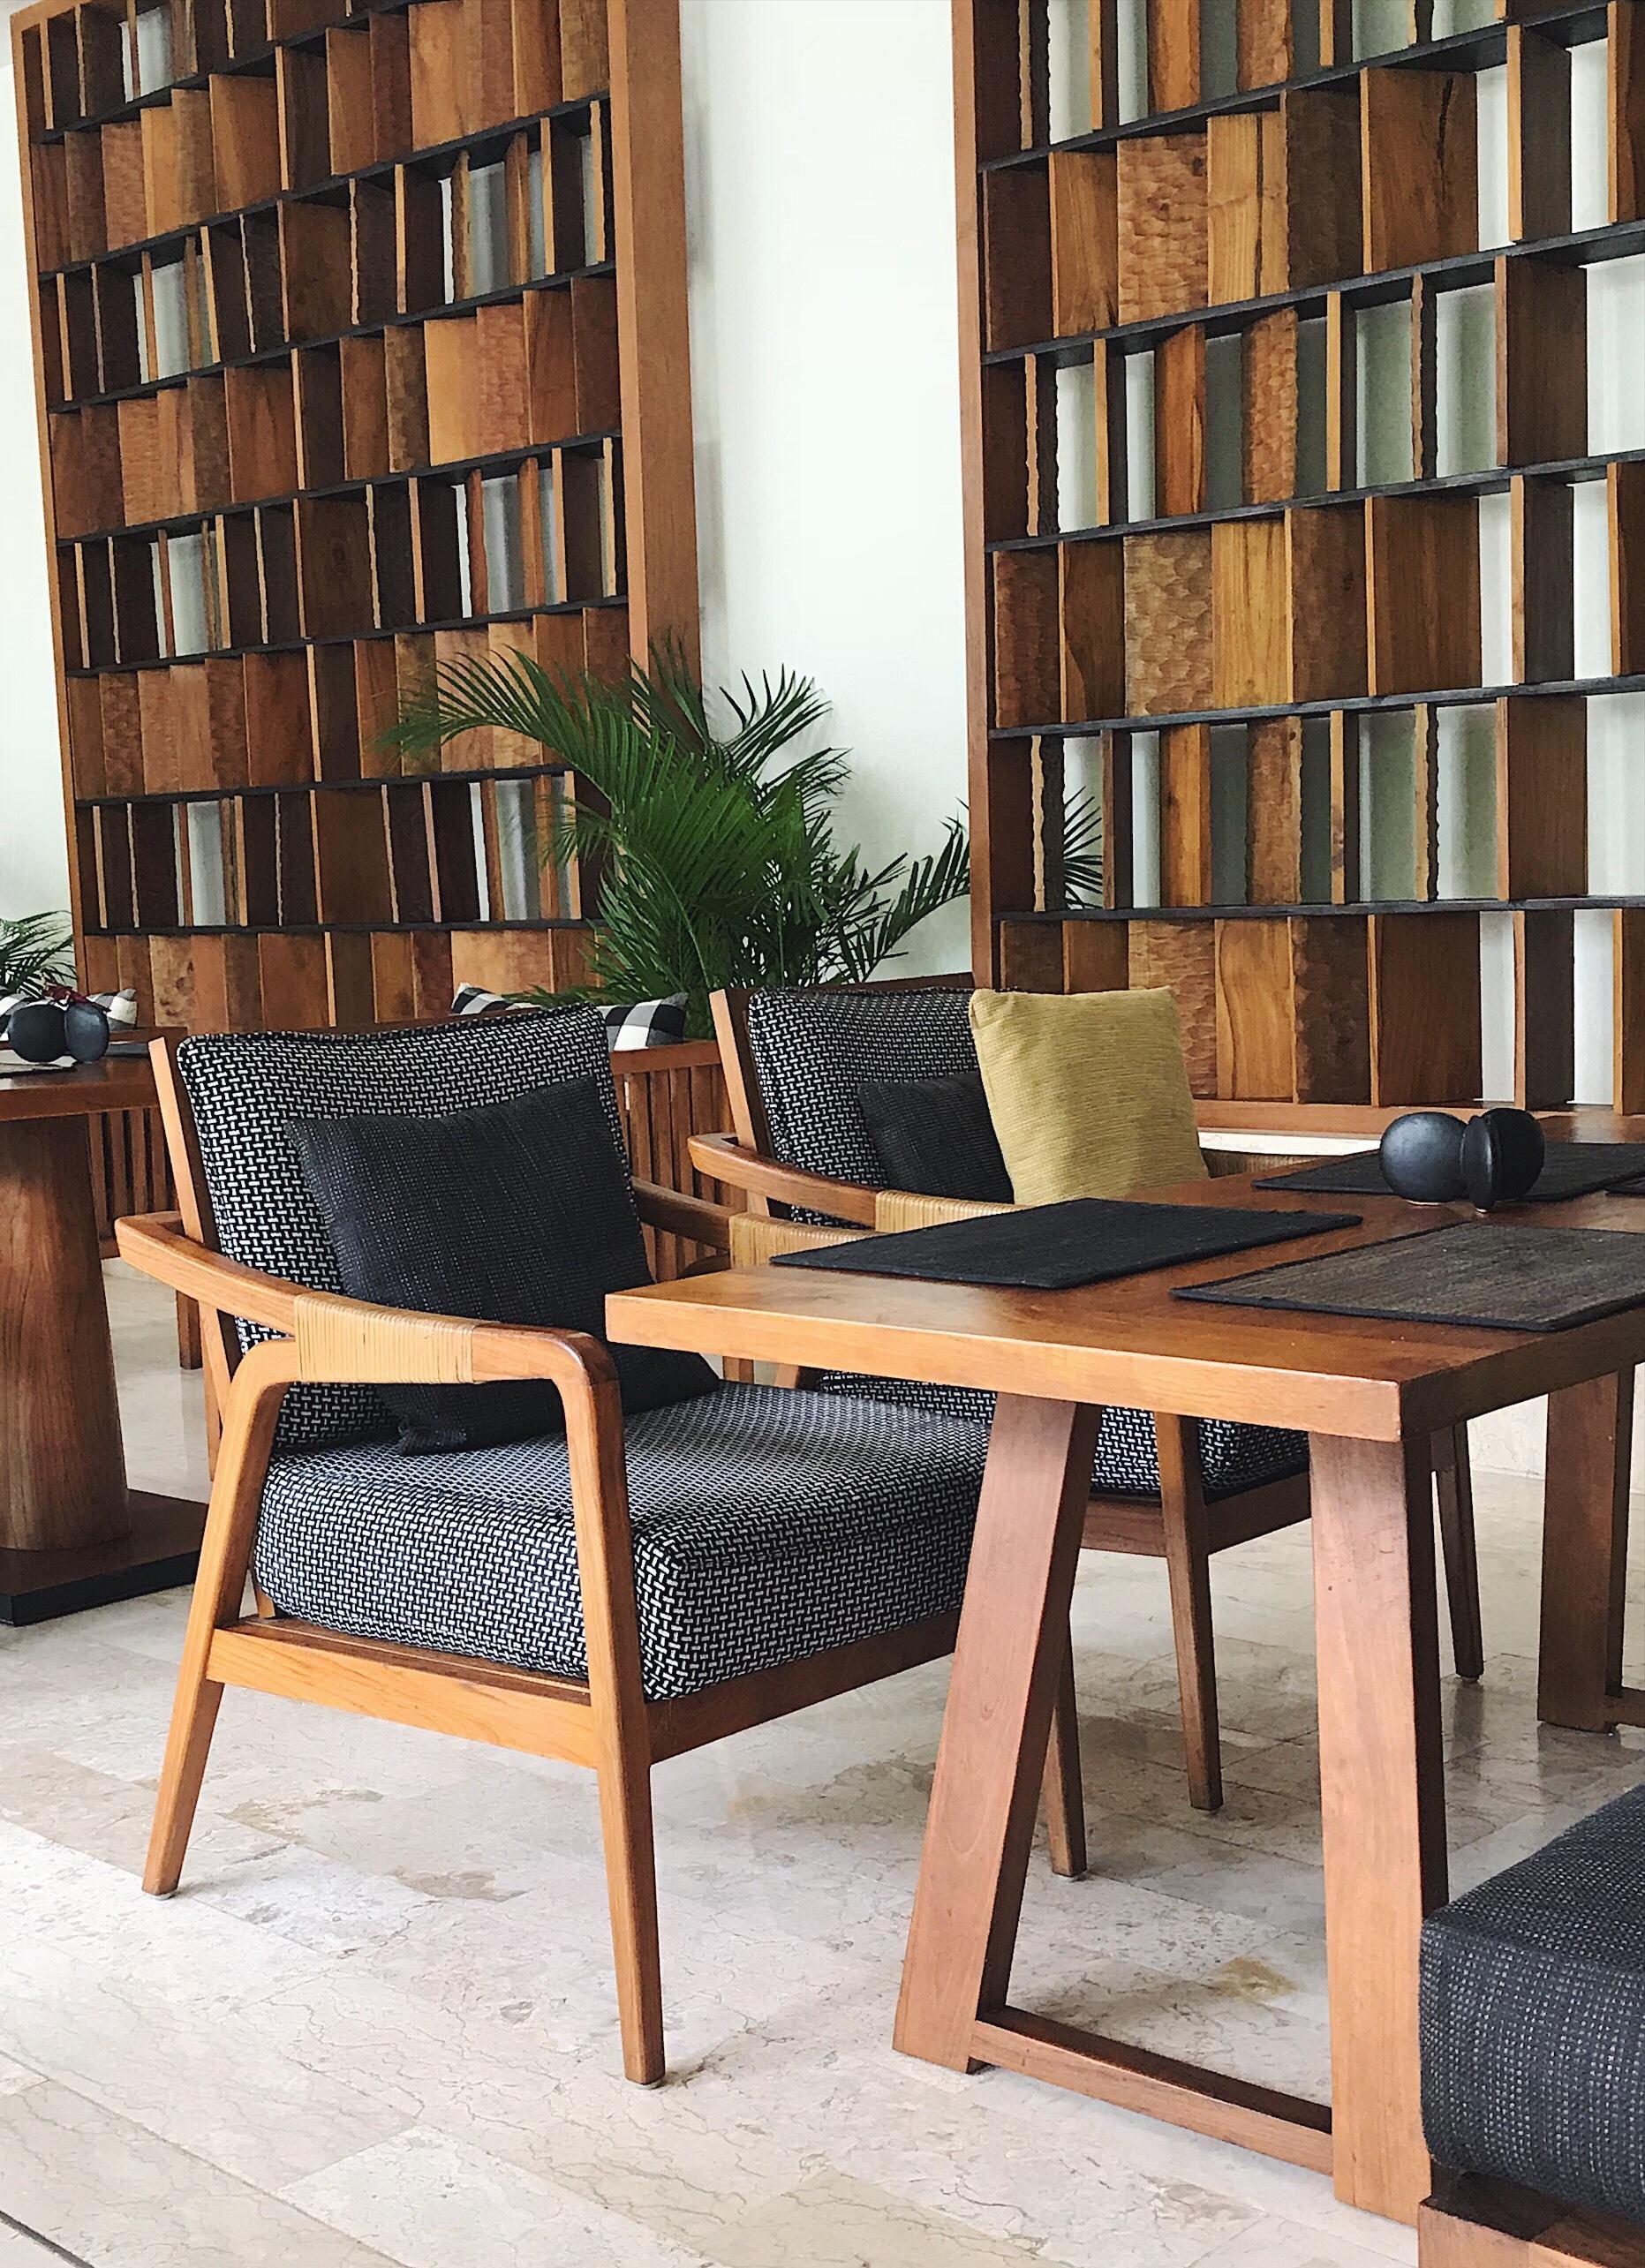 Balinese Style Interior: Balinese Interior Style